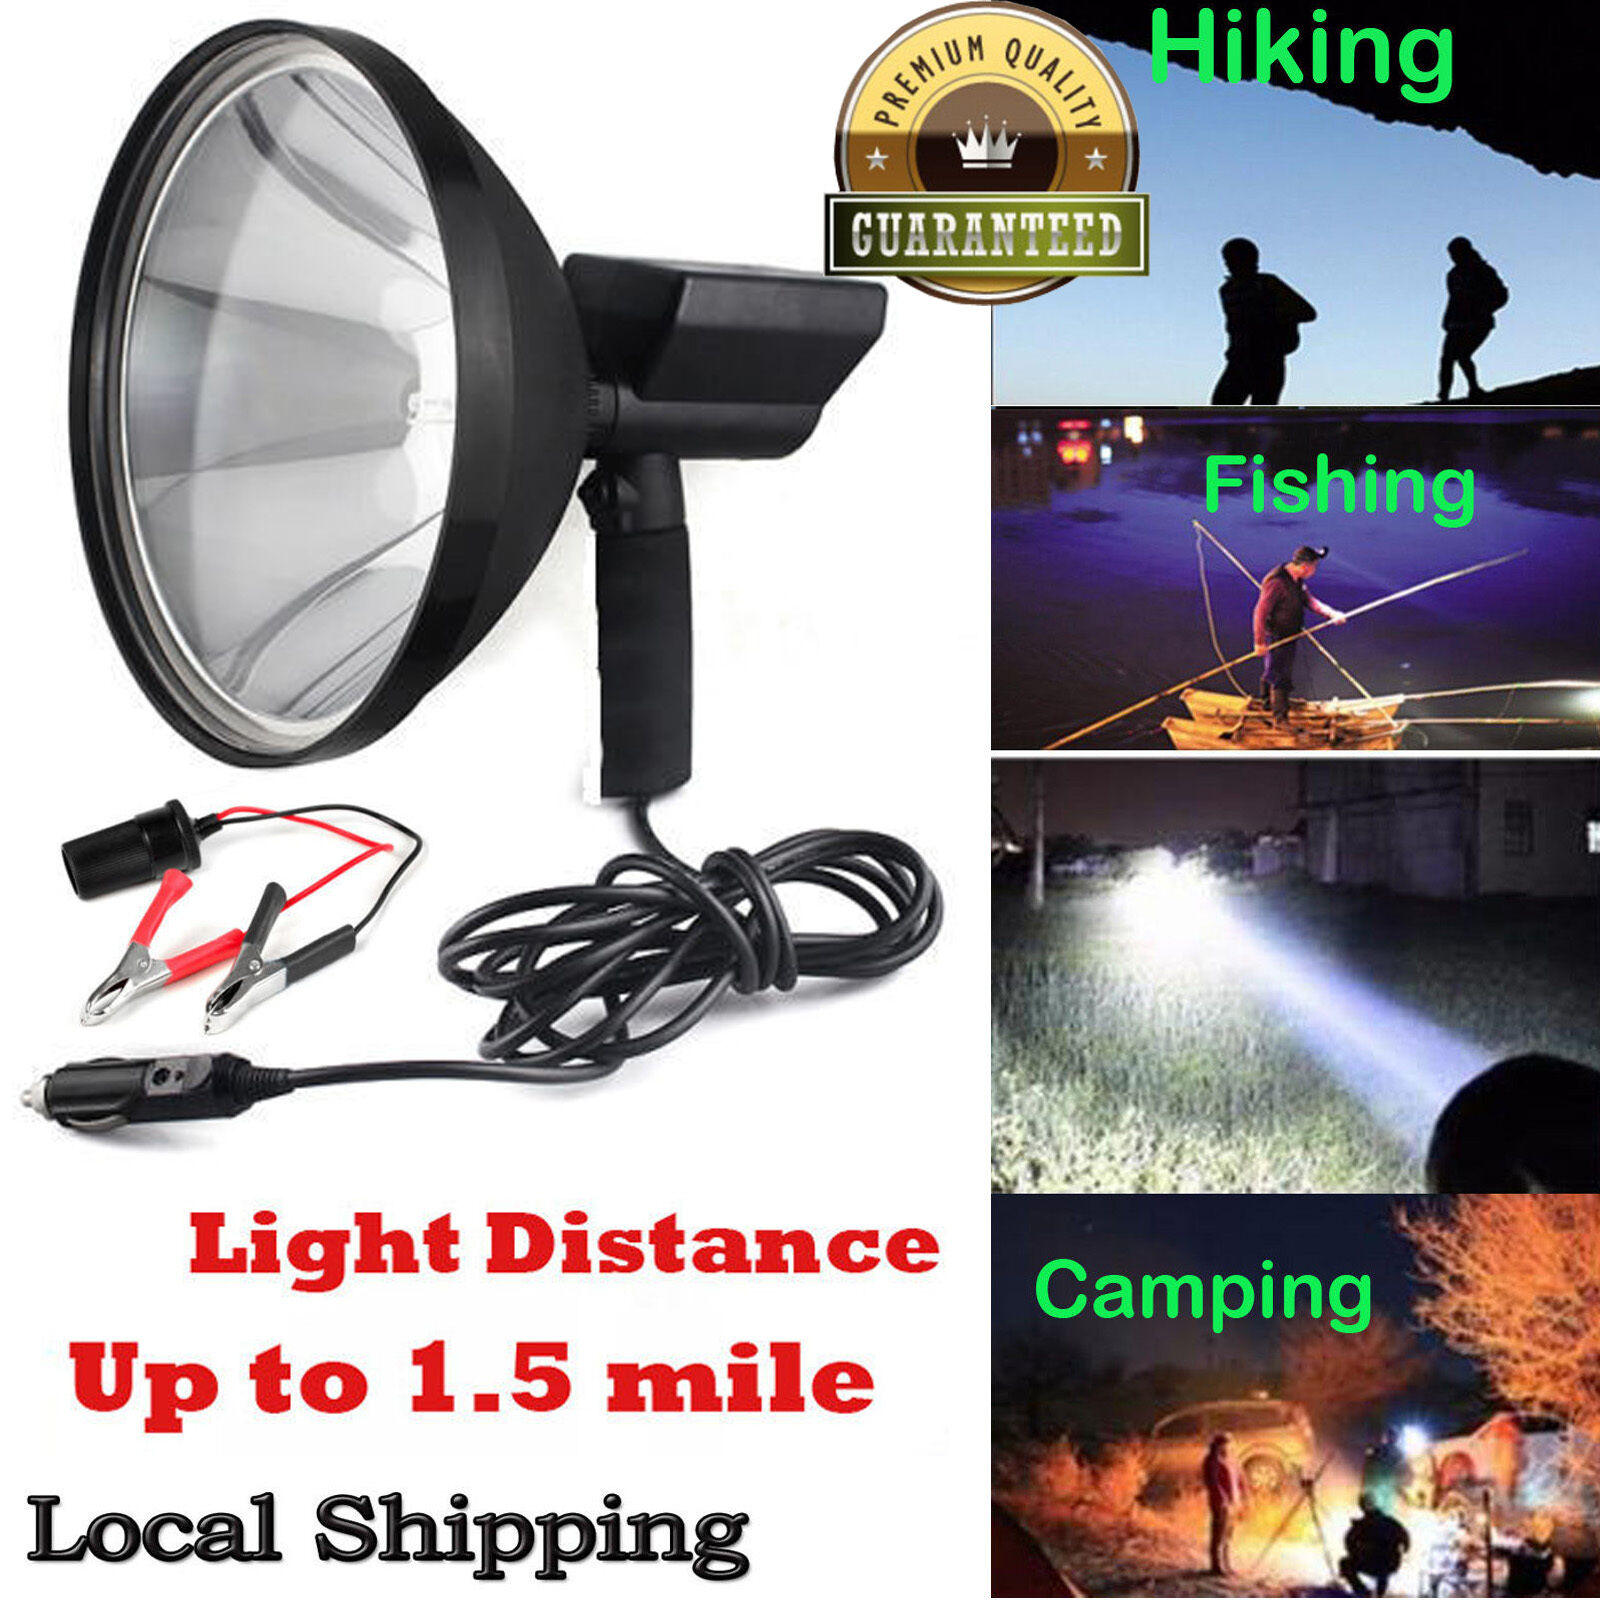 Handheld Hunting HID Spot Light Lamp 240mm Lamping Foxing Shooting 12V 100W 9''